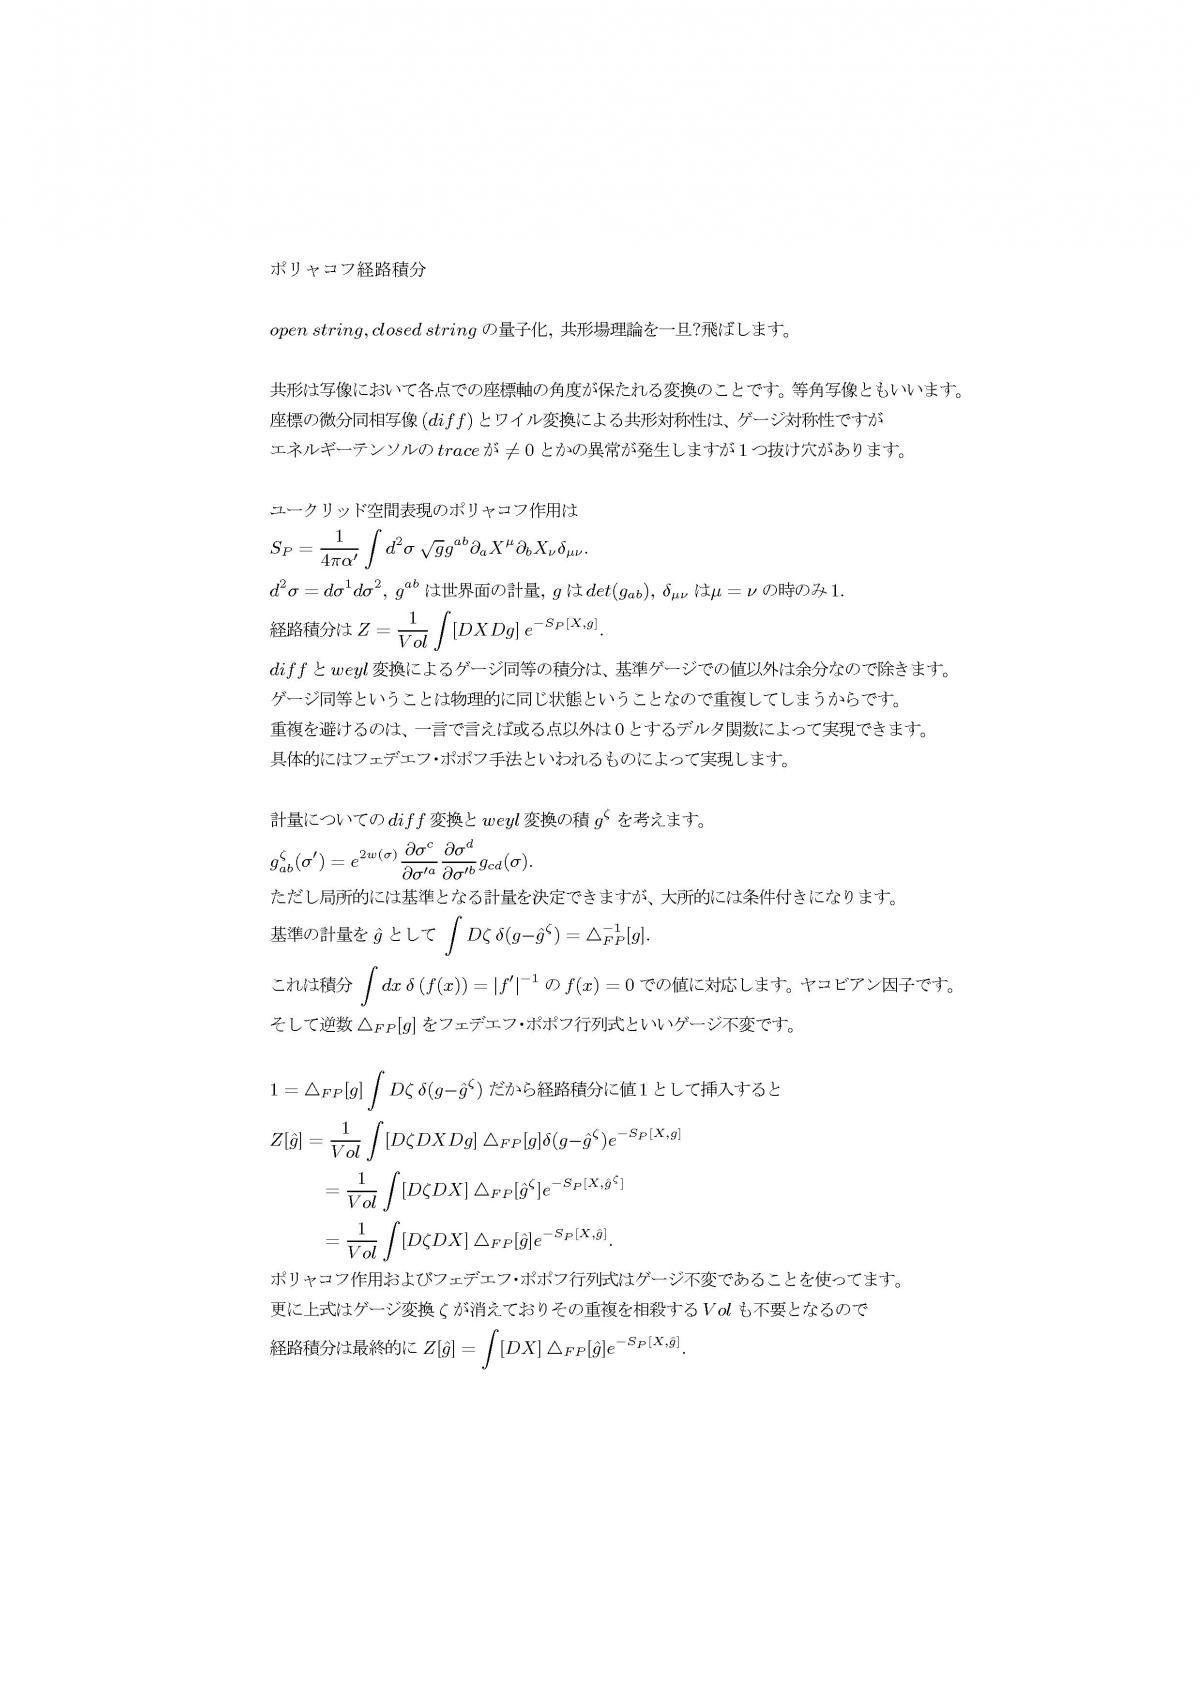 zgen04a.jpg